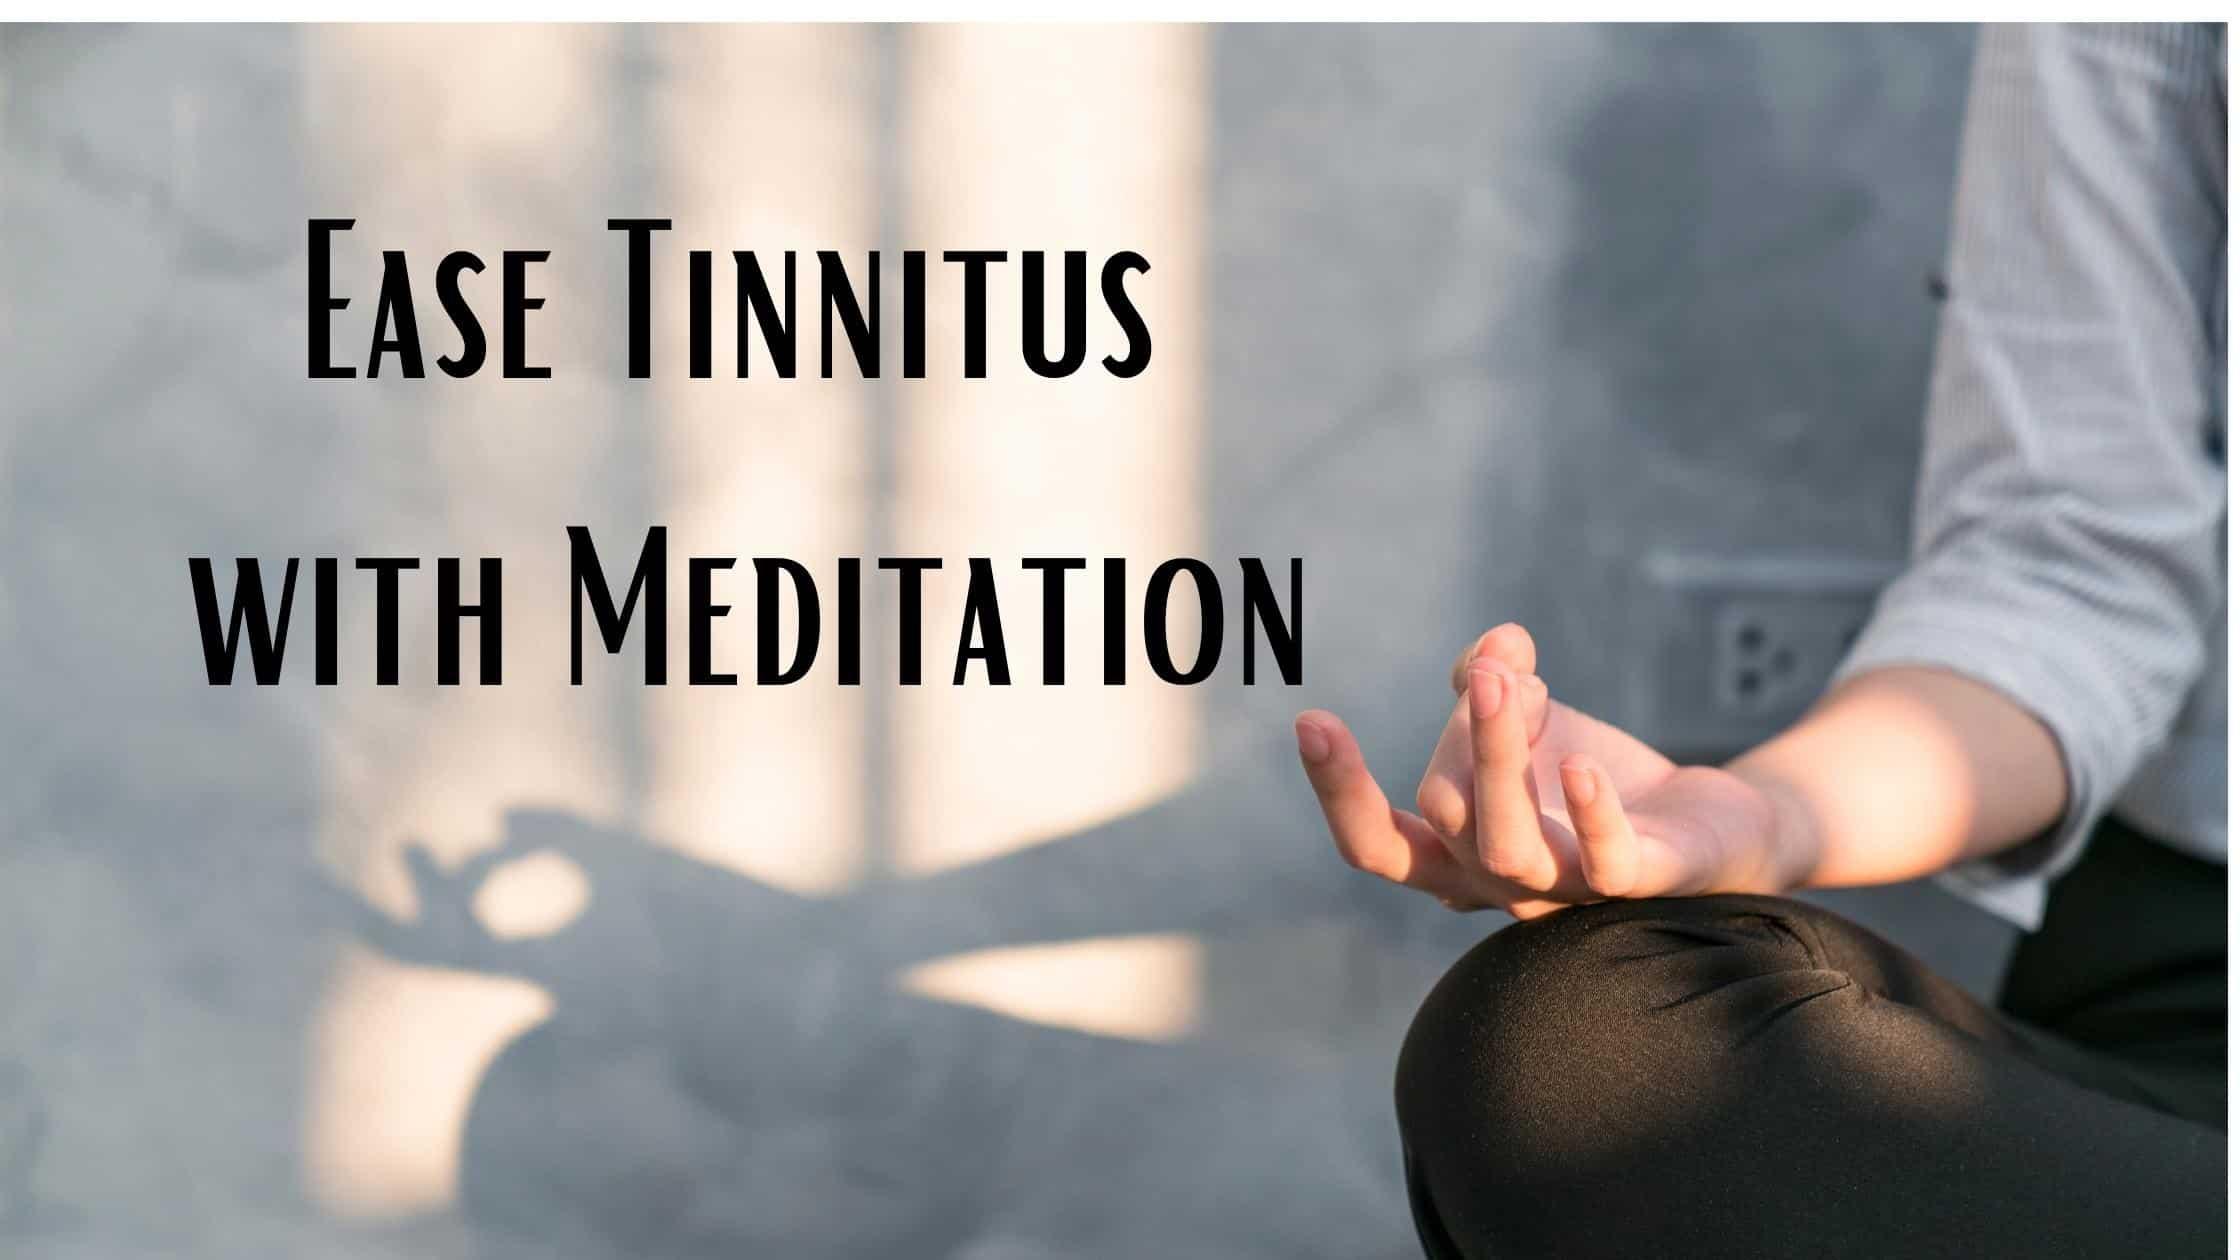 Ease Tinnitus with Meditation